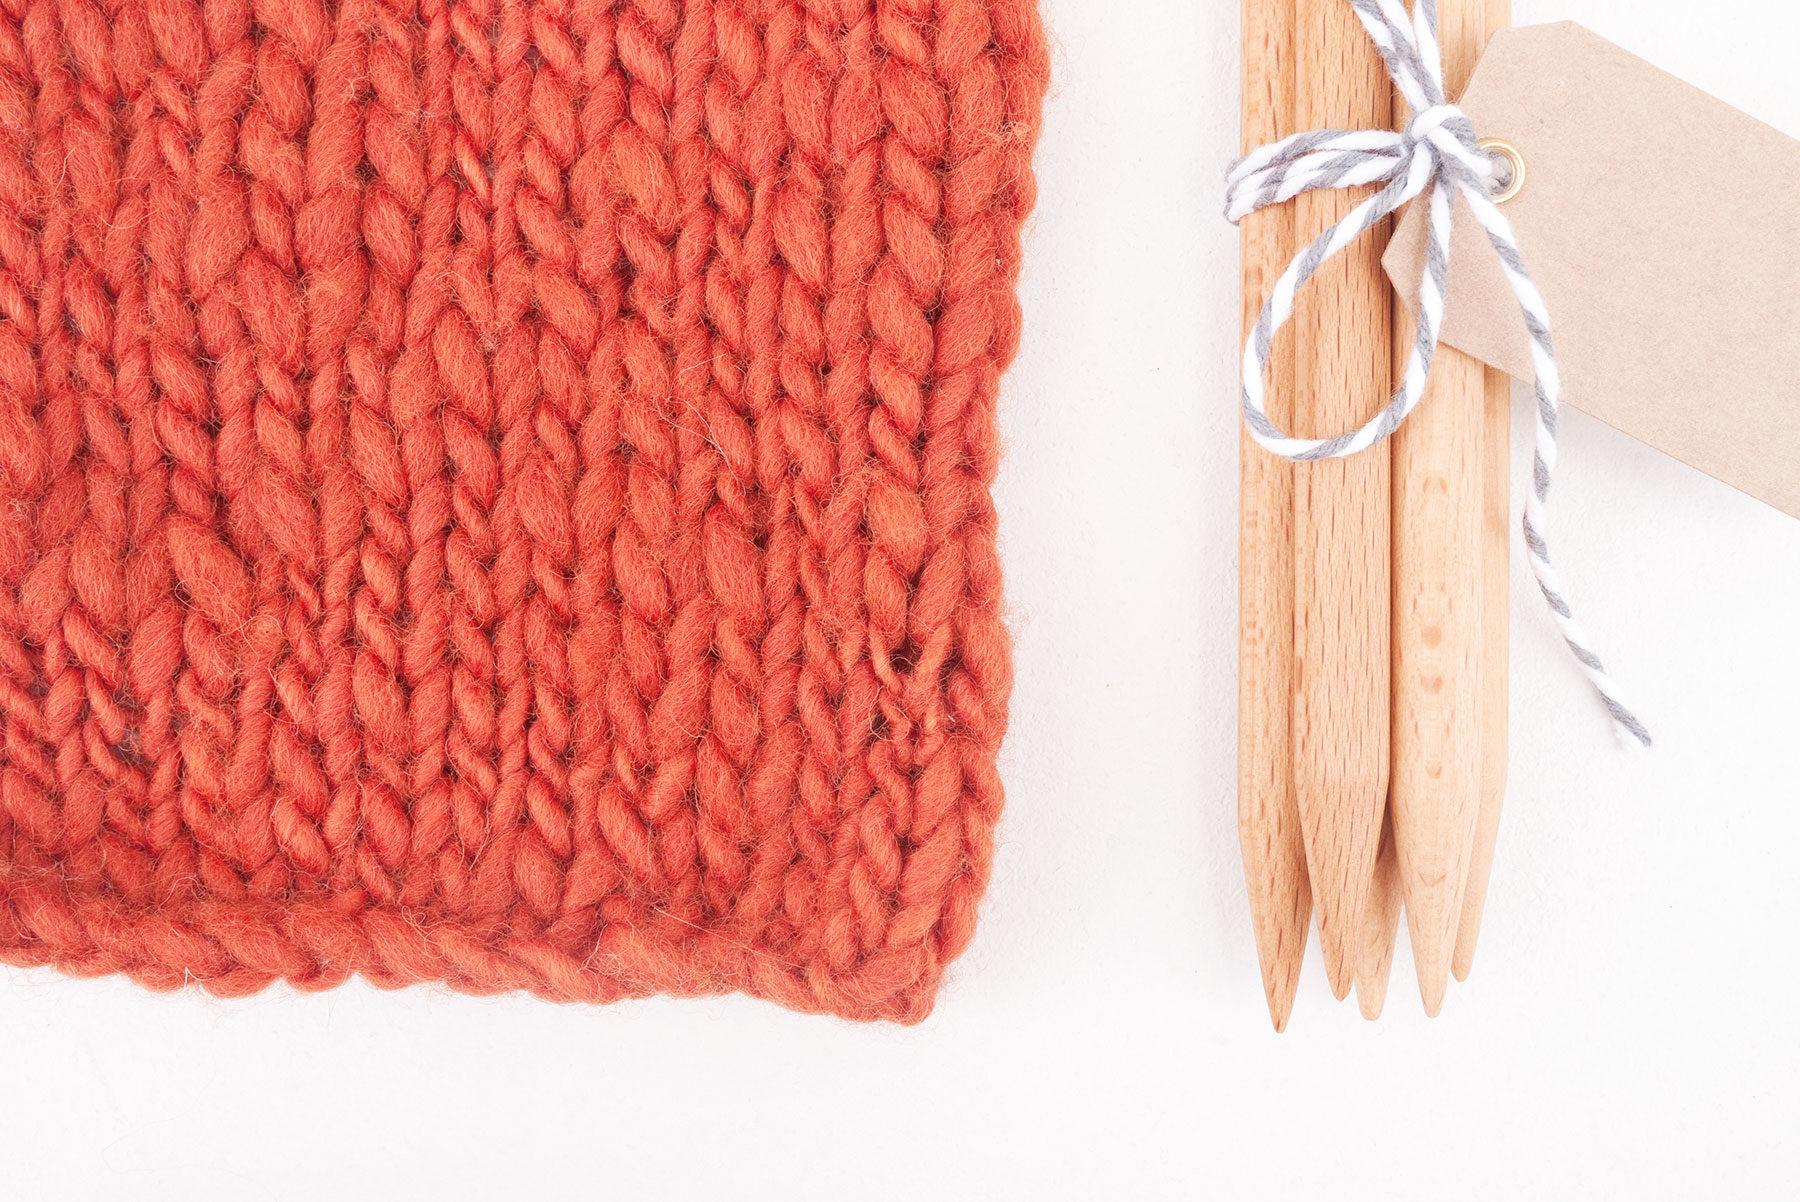 Anna & Juan Wolle «Plant Dyed» – Merino Handgesponnen – Super Bulky